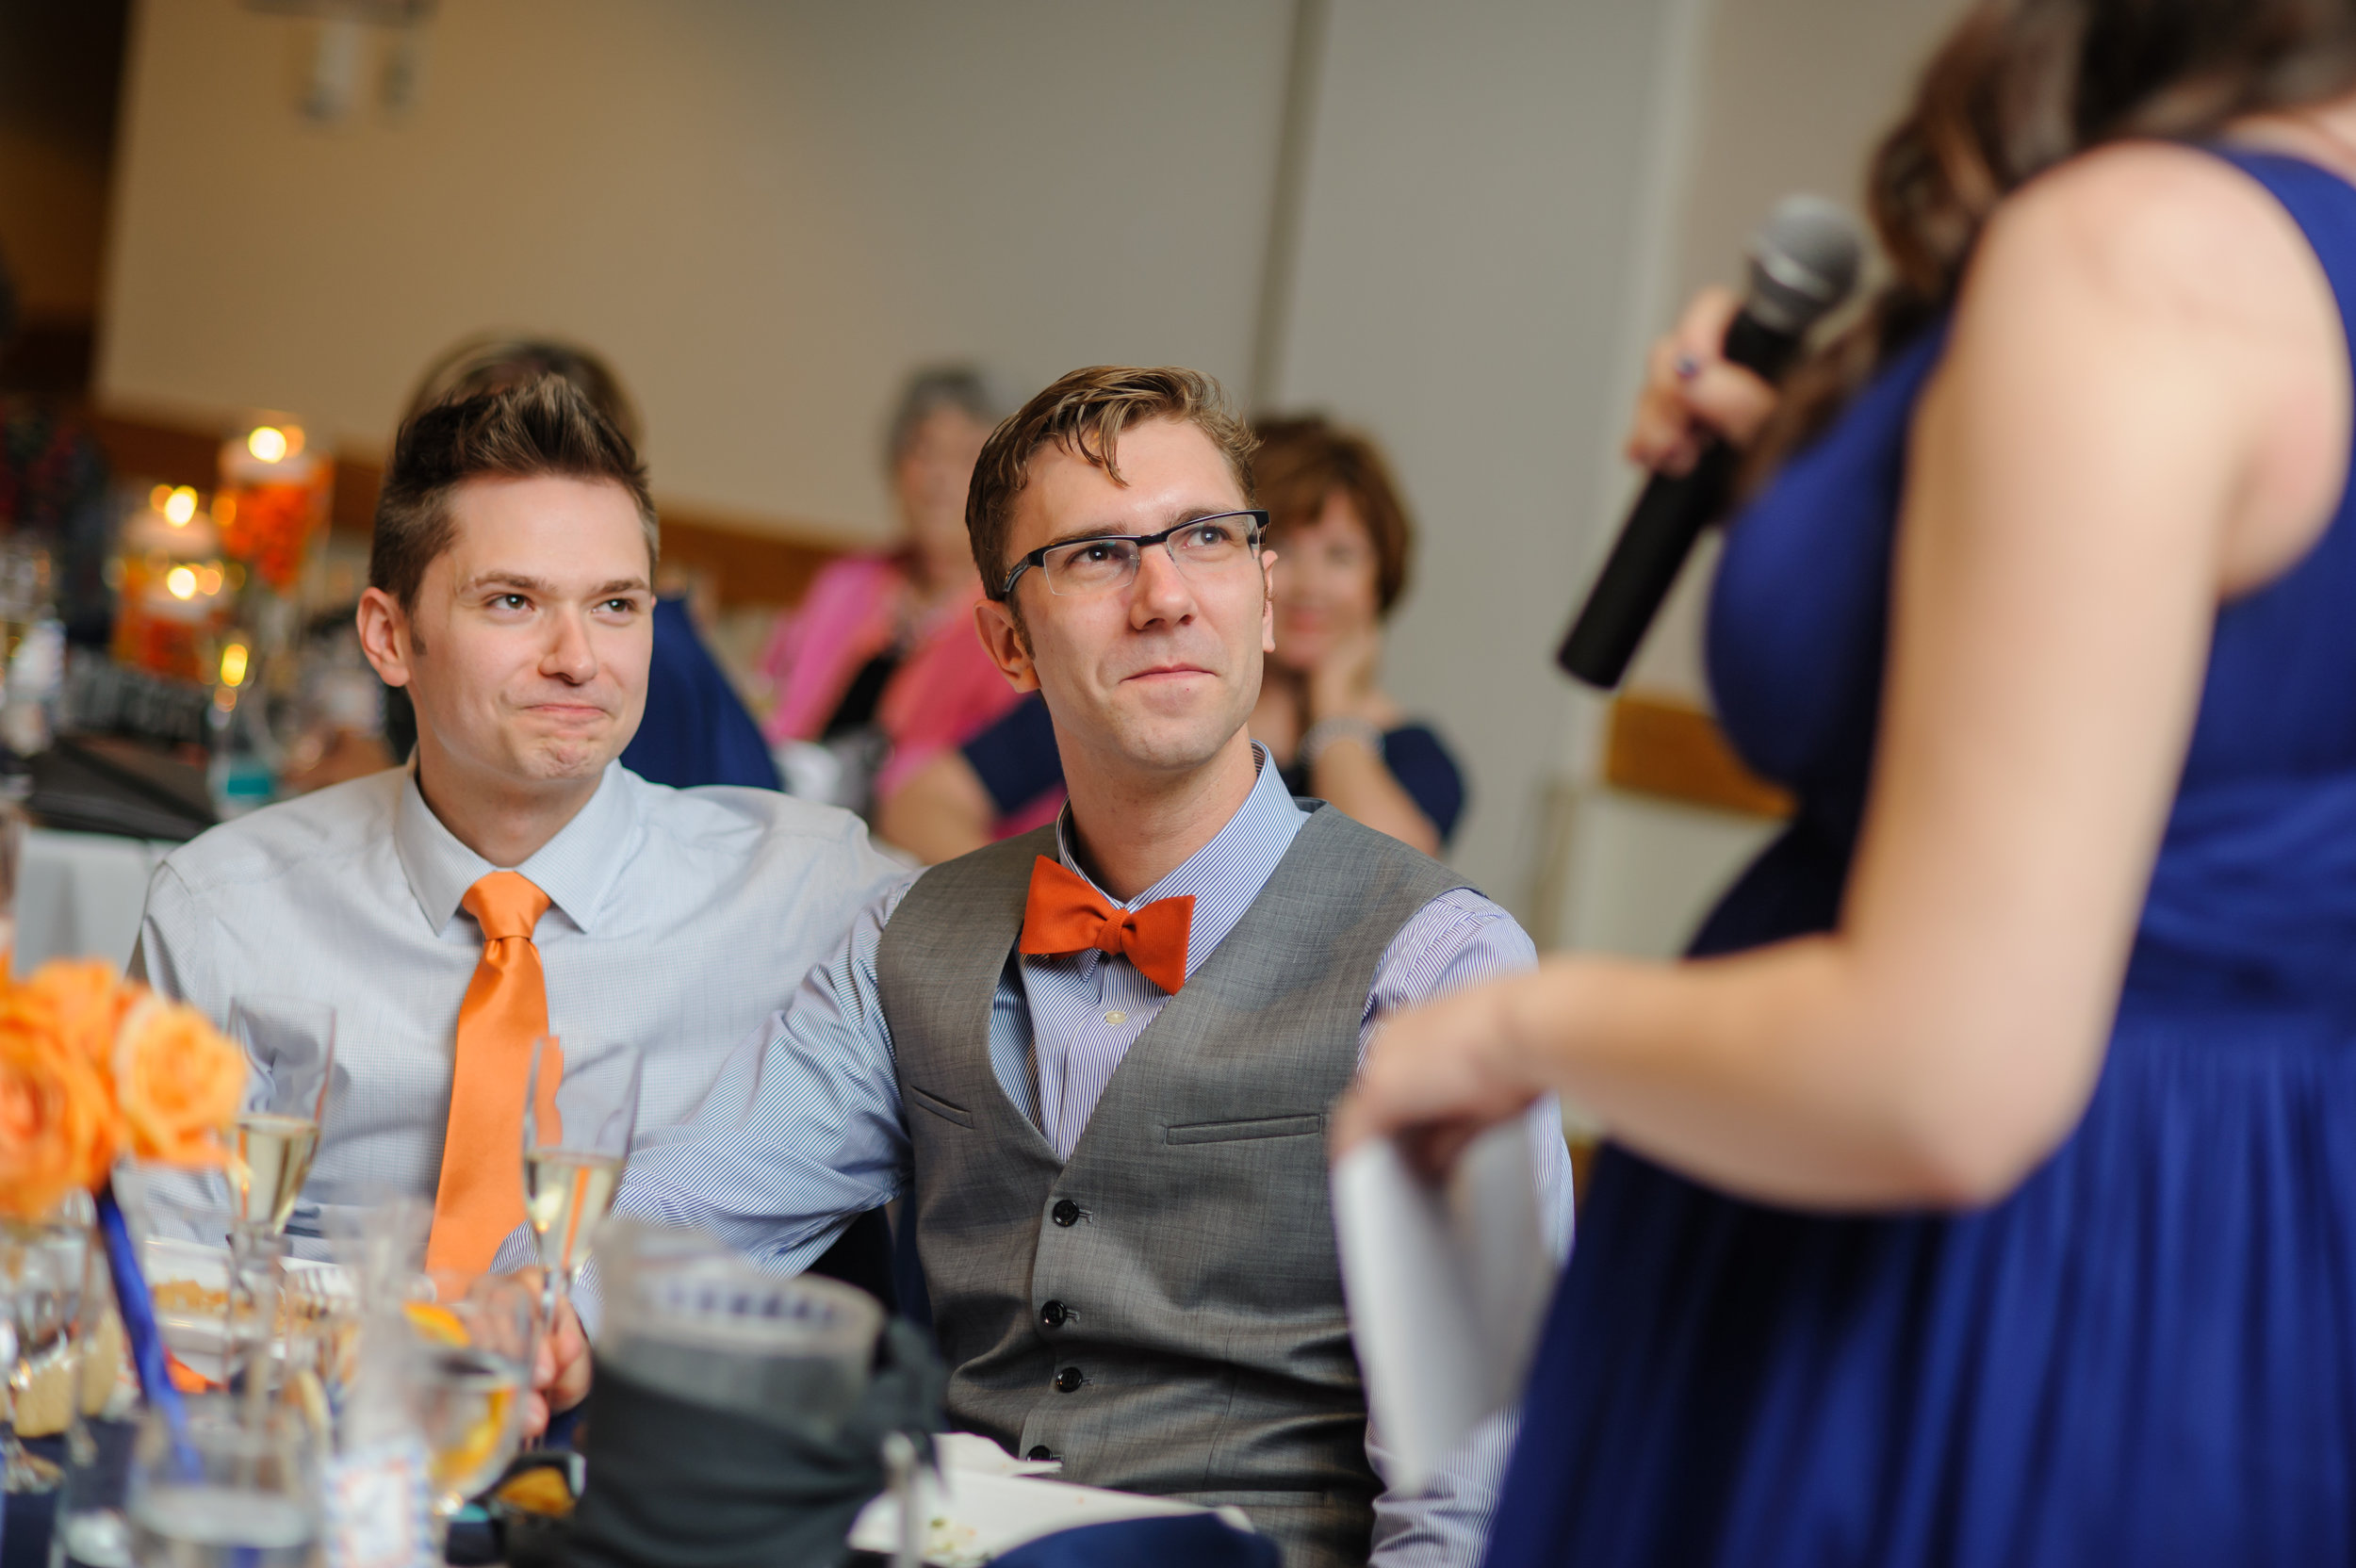 josh-parker-055-same-sex-sacramento-wedding-photographer-katherine-nicole-photography.JPG